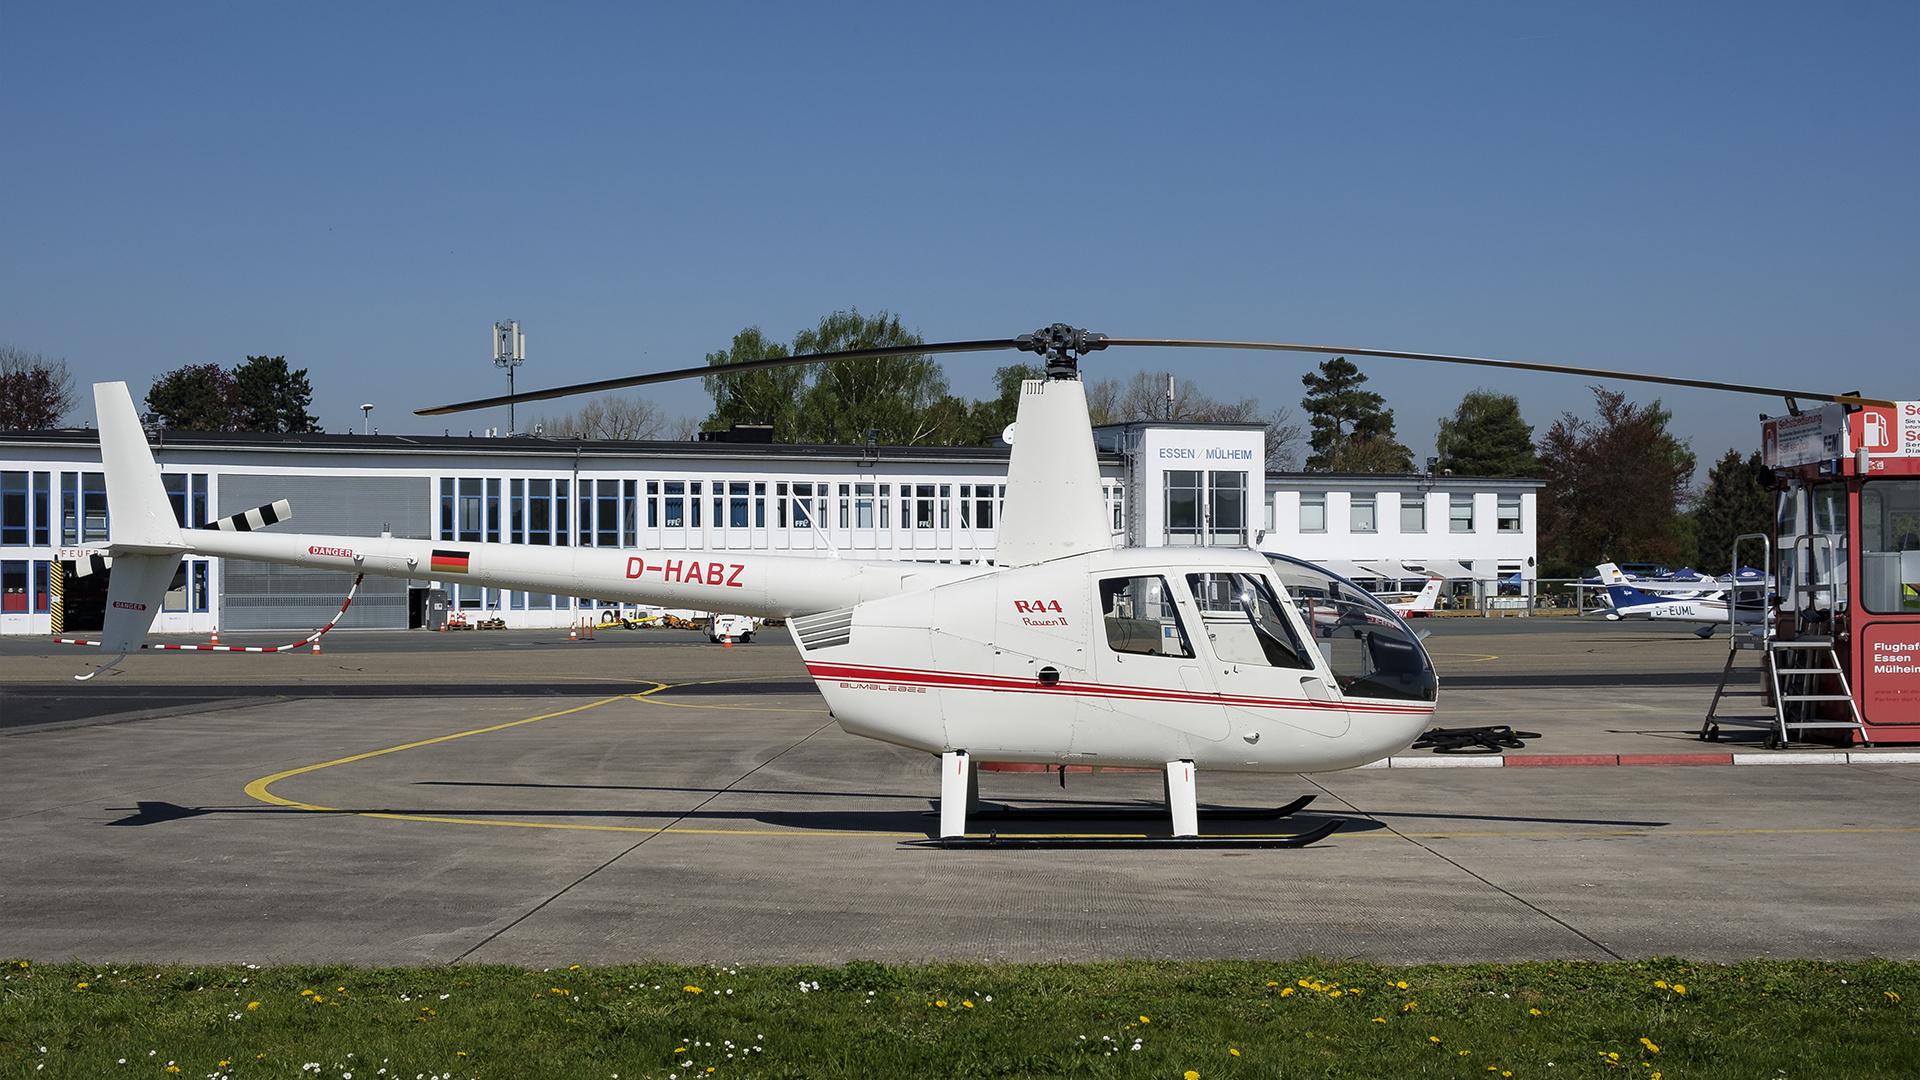 D-HABZ-1 R44 DUS 201904